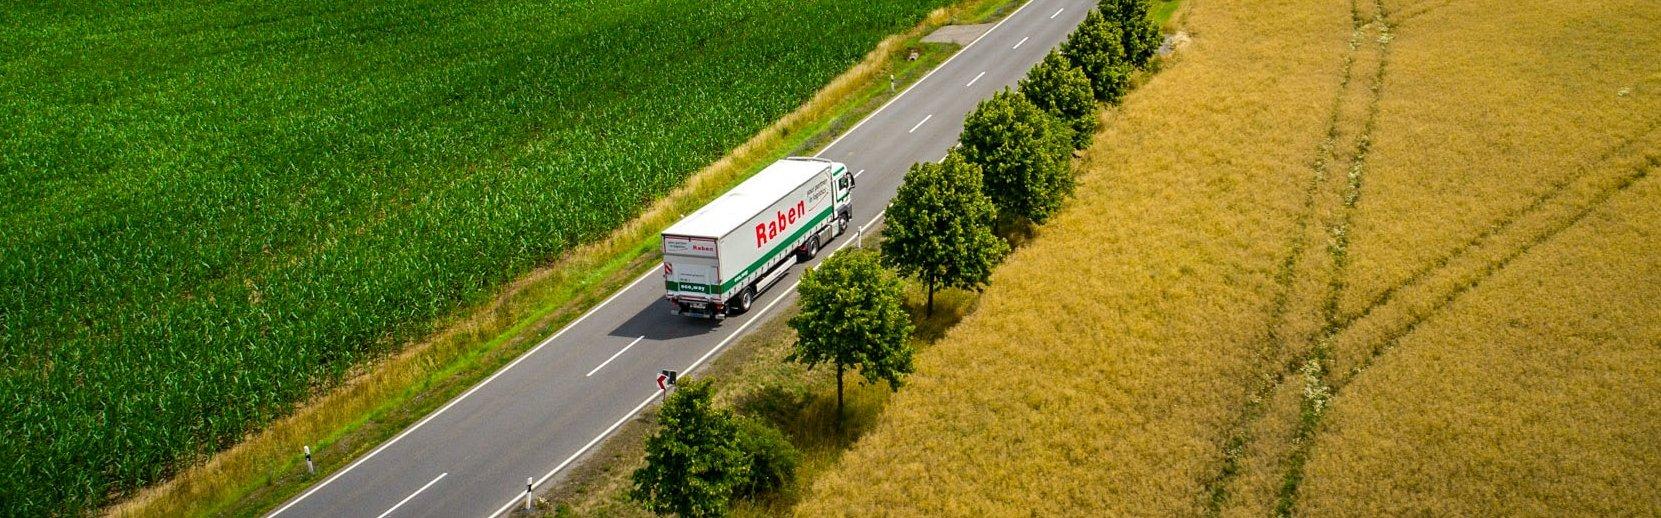 csm_Raben_road_transport_long_truck_old_branding_2-min_1a326a54cd.jpg